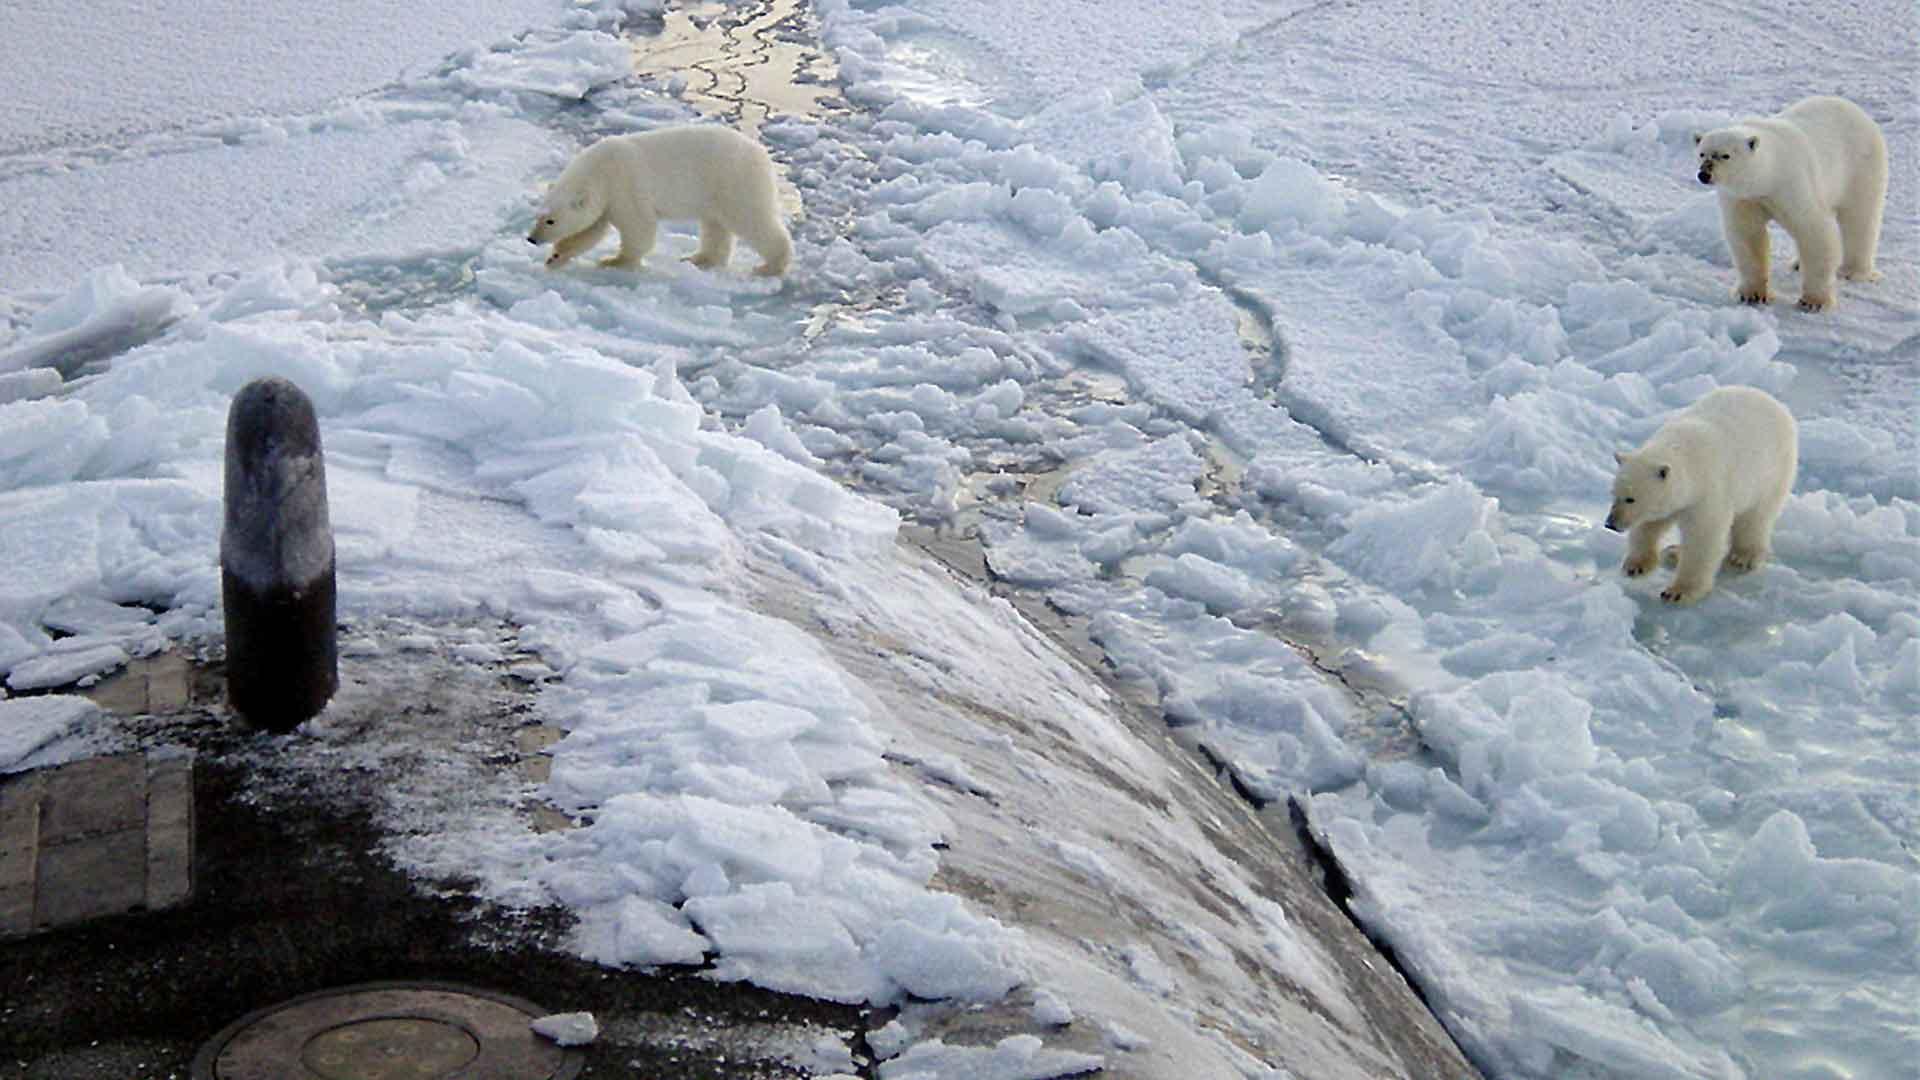 Parvati Foundation, Arctic Free, MAPS, The Marine Arctic Peace Sanctuary, northern sea route, Arctic Sea ice extent